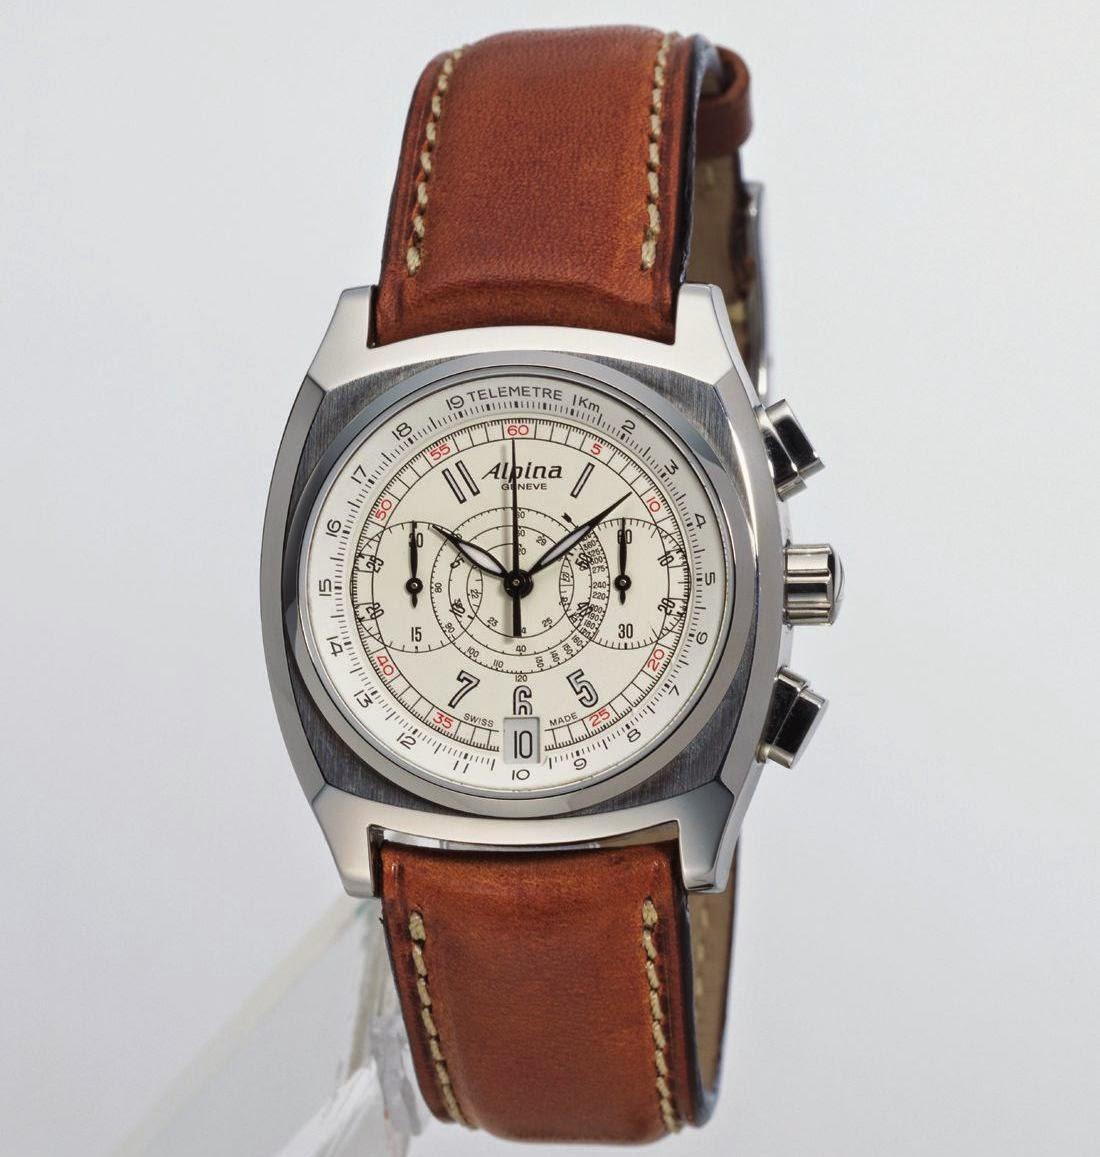 ALPINA Heritage Chronograph, Steel Version